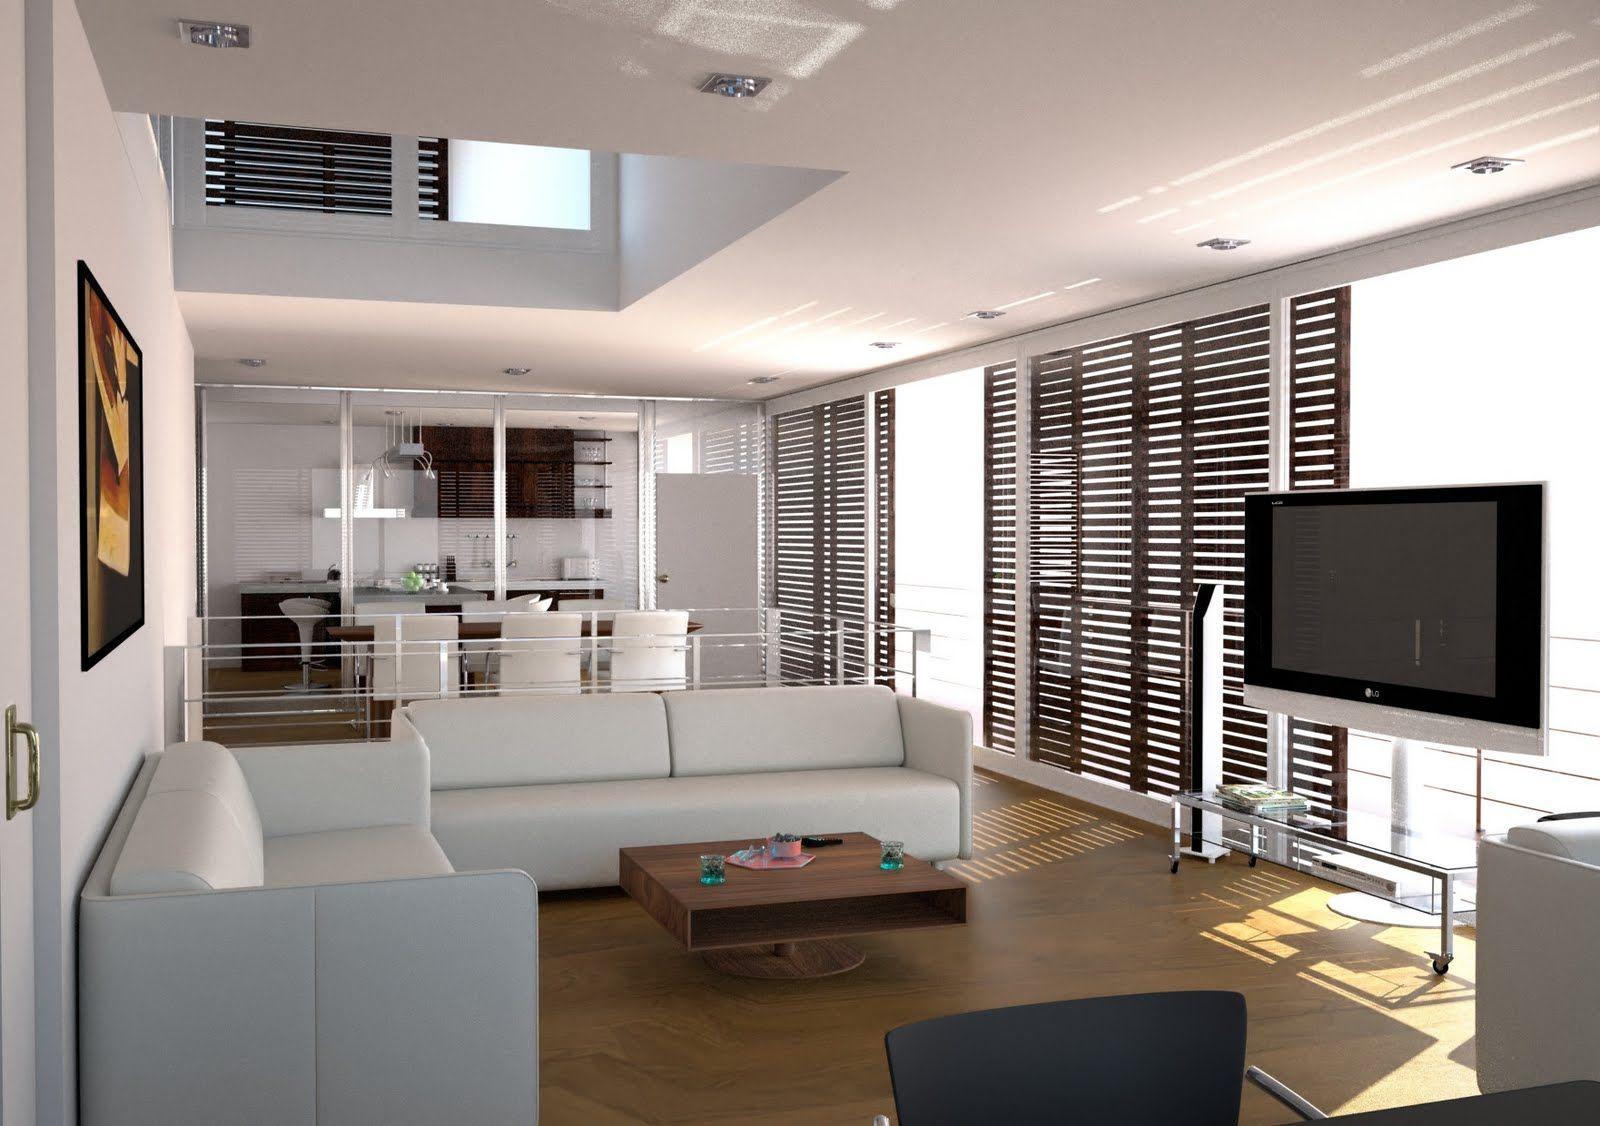 Interior Lines Horizontal Vertical Minimalist Simple Shapes Tips Geometric Specialist Sha Modern Small Apartment Design Small Apartment Design Minimalist Decor